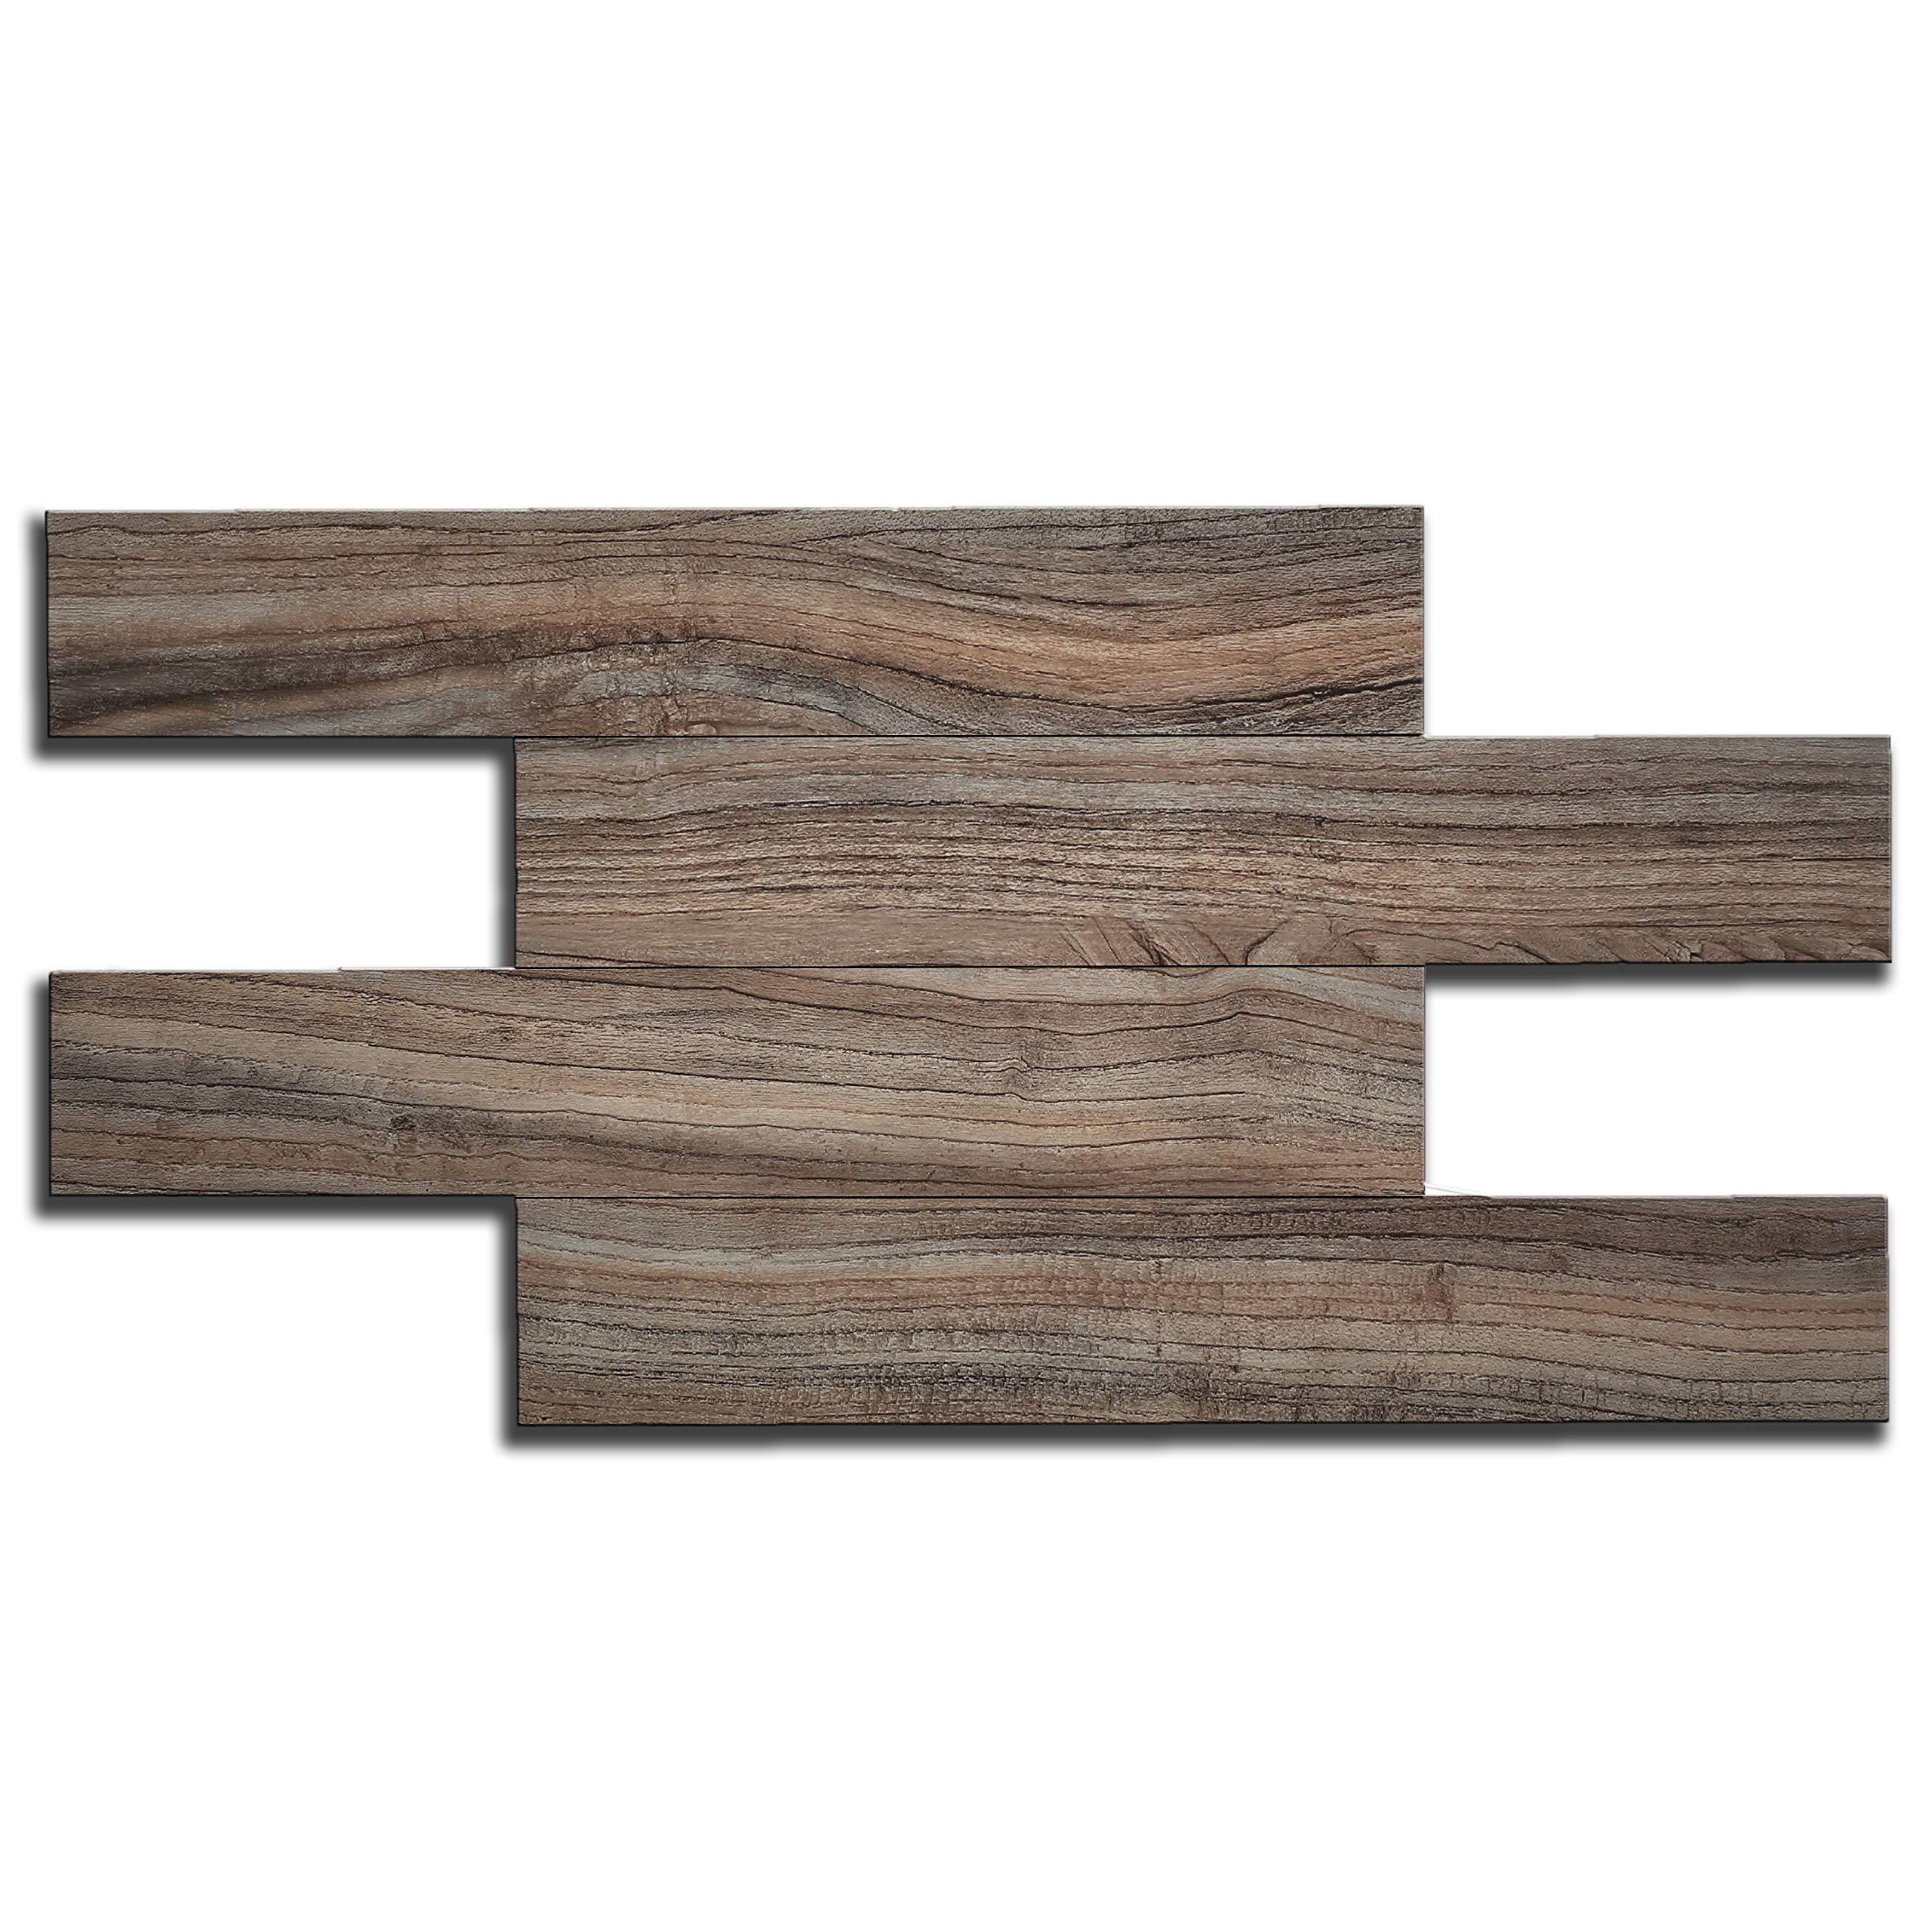 artesanía muro Kitchen Backsplash Tiles, Wood Grain, Adhesive, Fire Proof, Water Proof, Anti-Moldy,13.4 inch x 6.7 inch per Tile, Pack of 11 Tiles